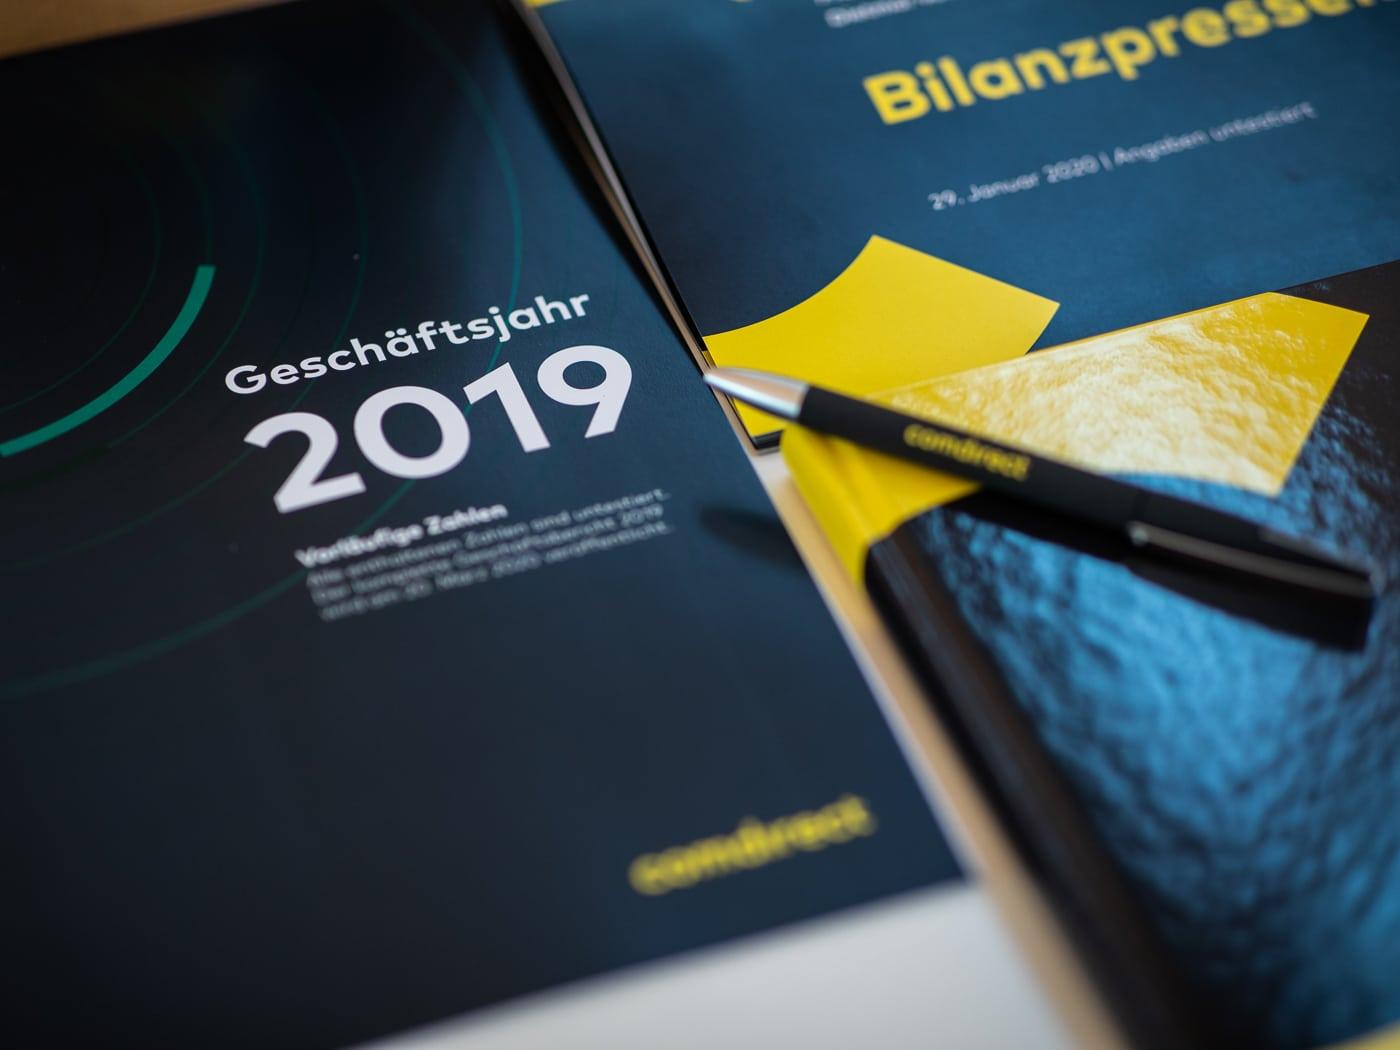 Businessfotografie Comdirect Jens Braune 8 1